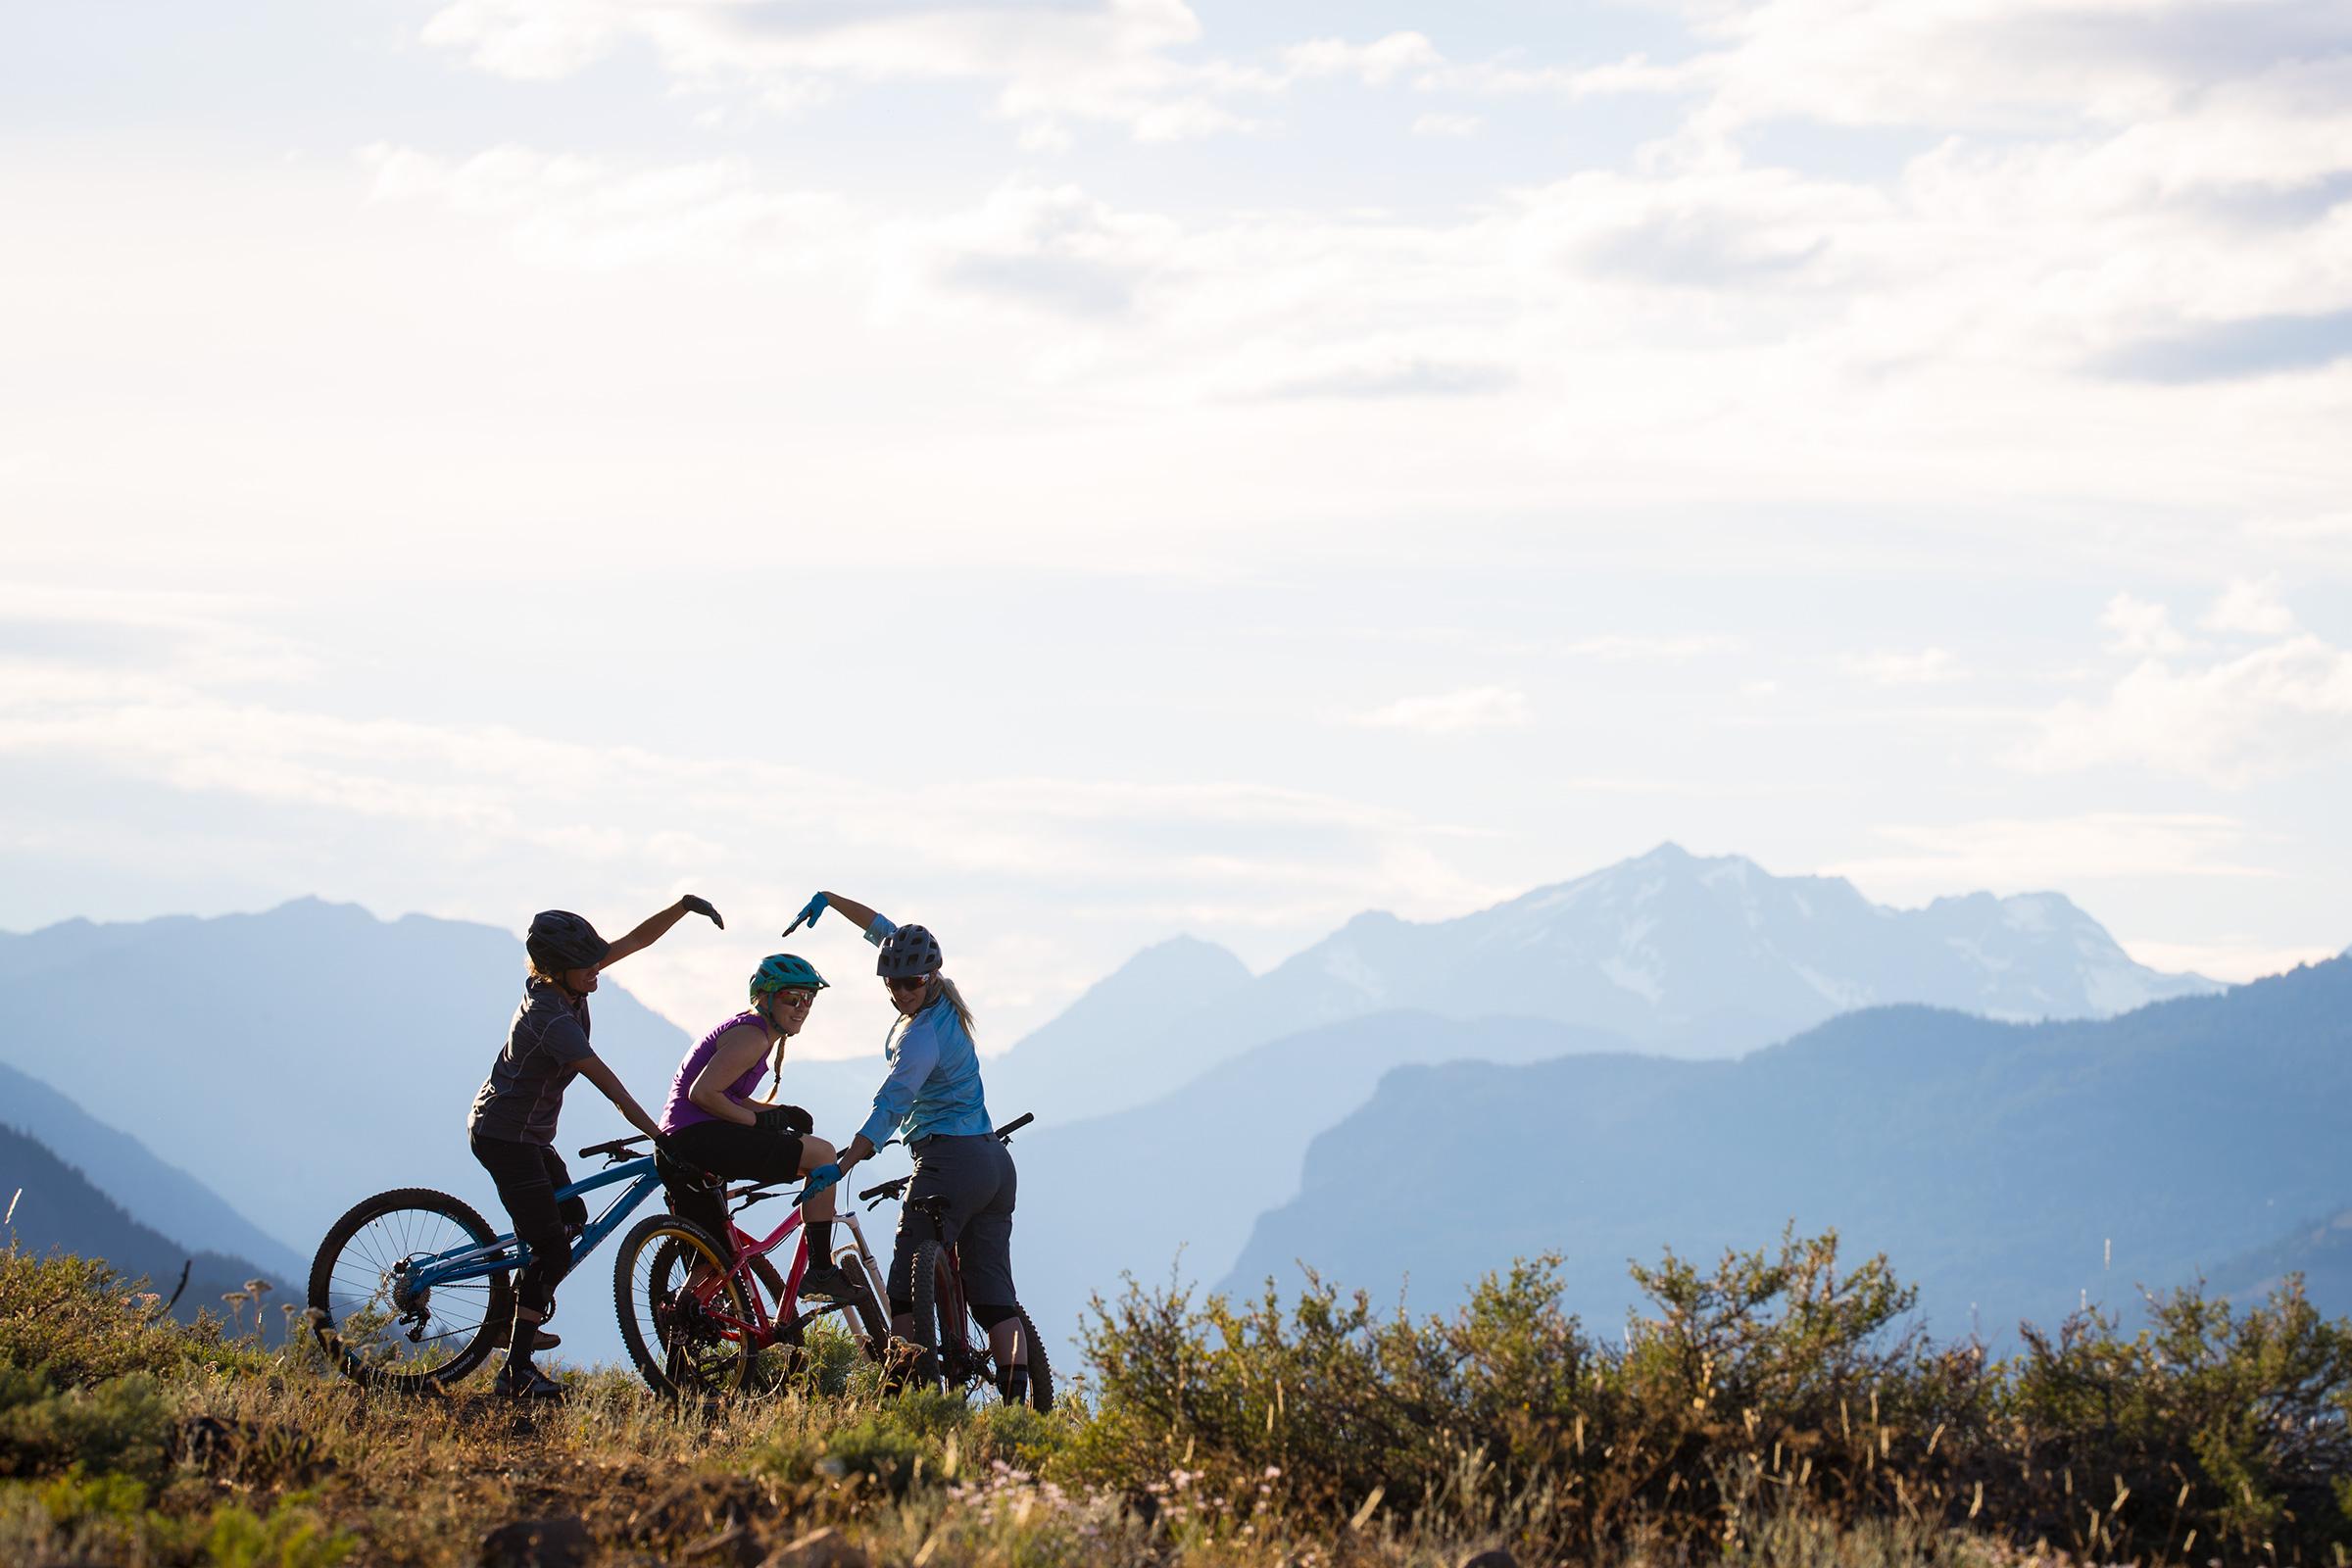 there's no shortage of inspiring women on mountain bikes